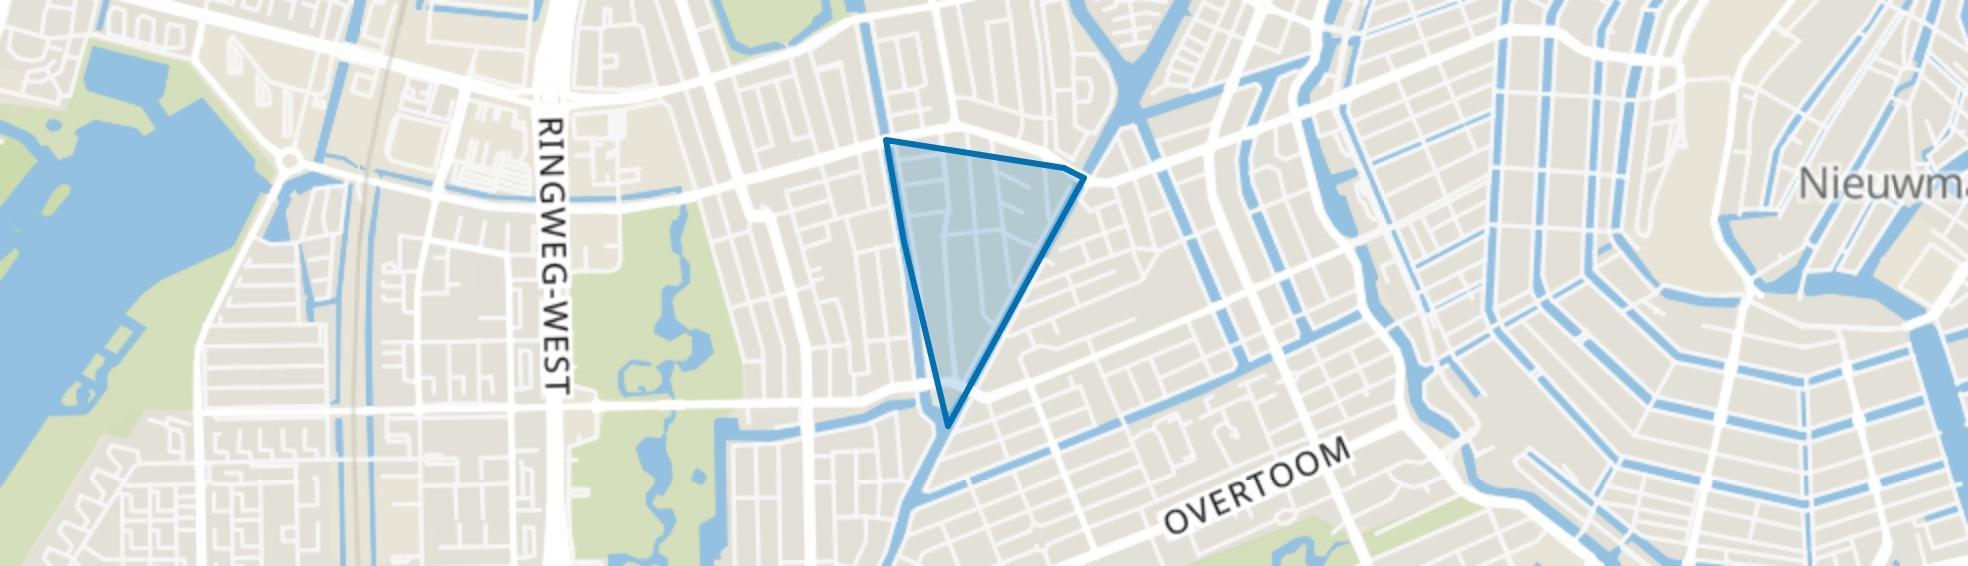 Chassébuurt, Amsterdam map